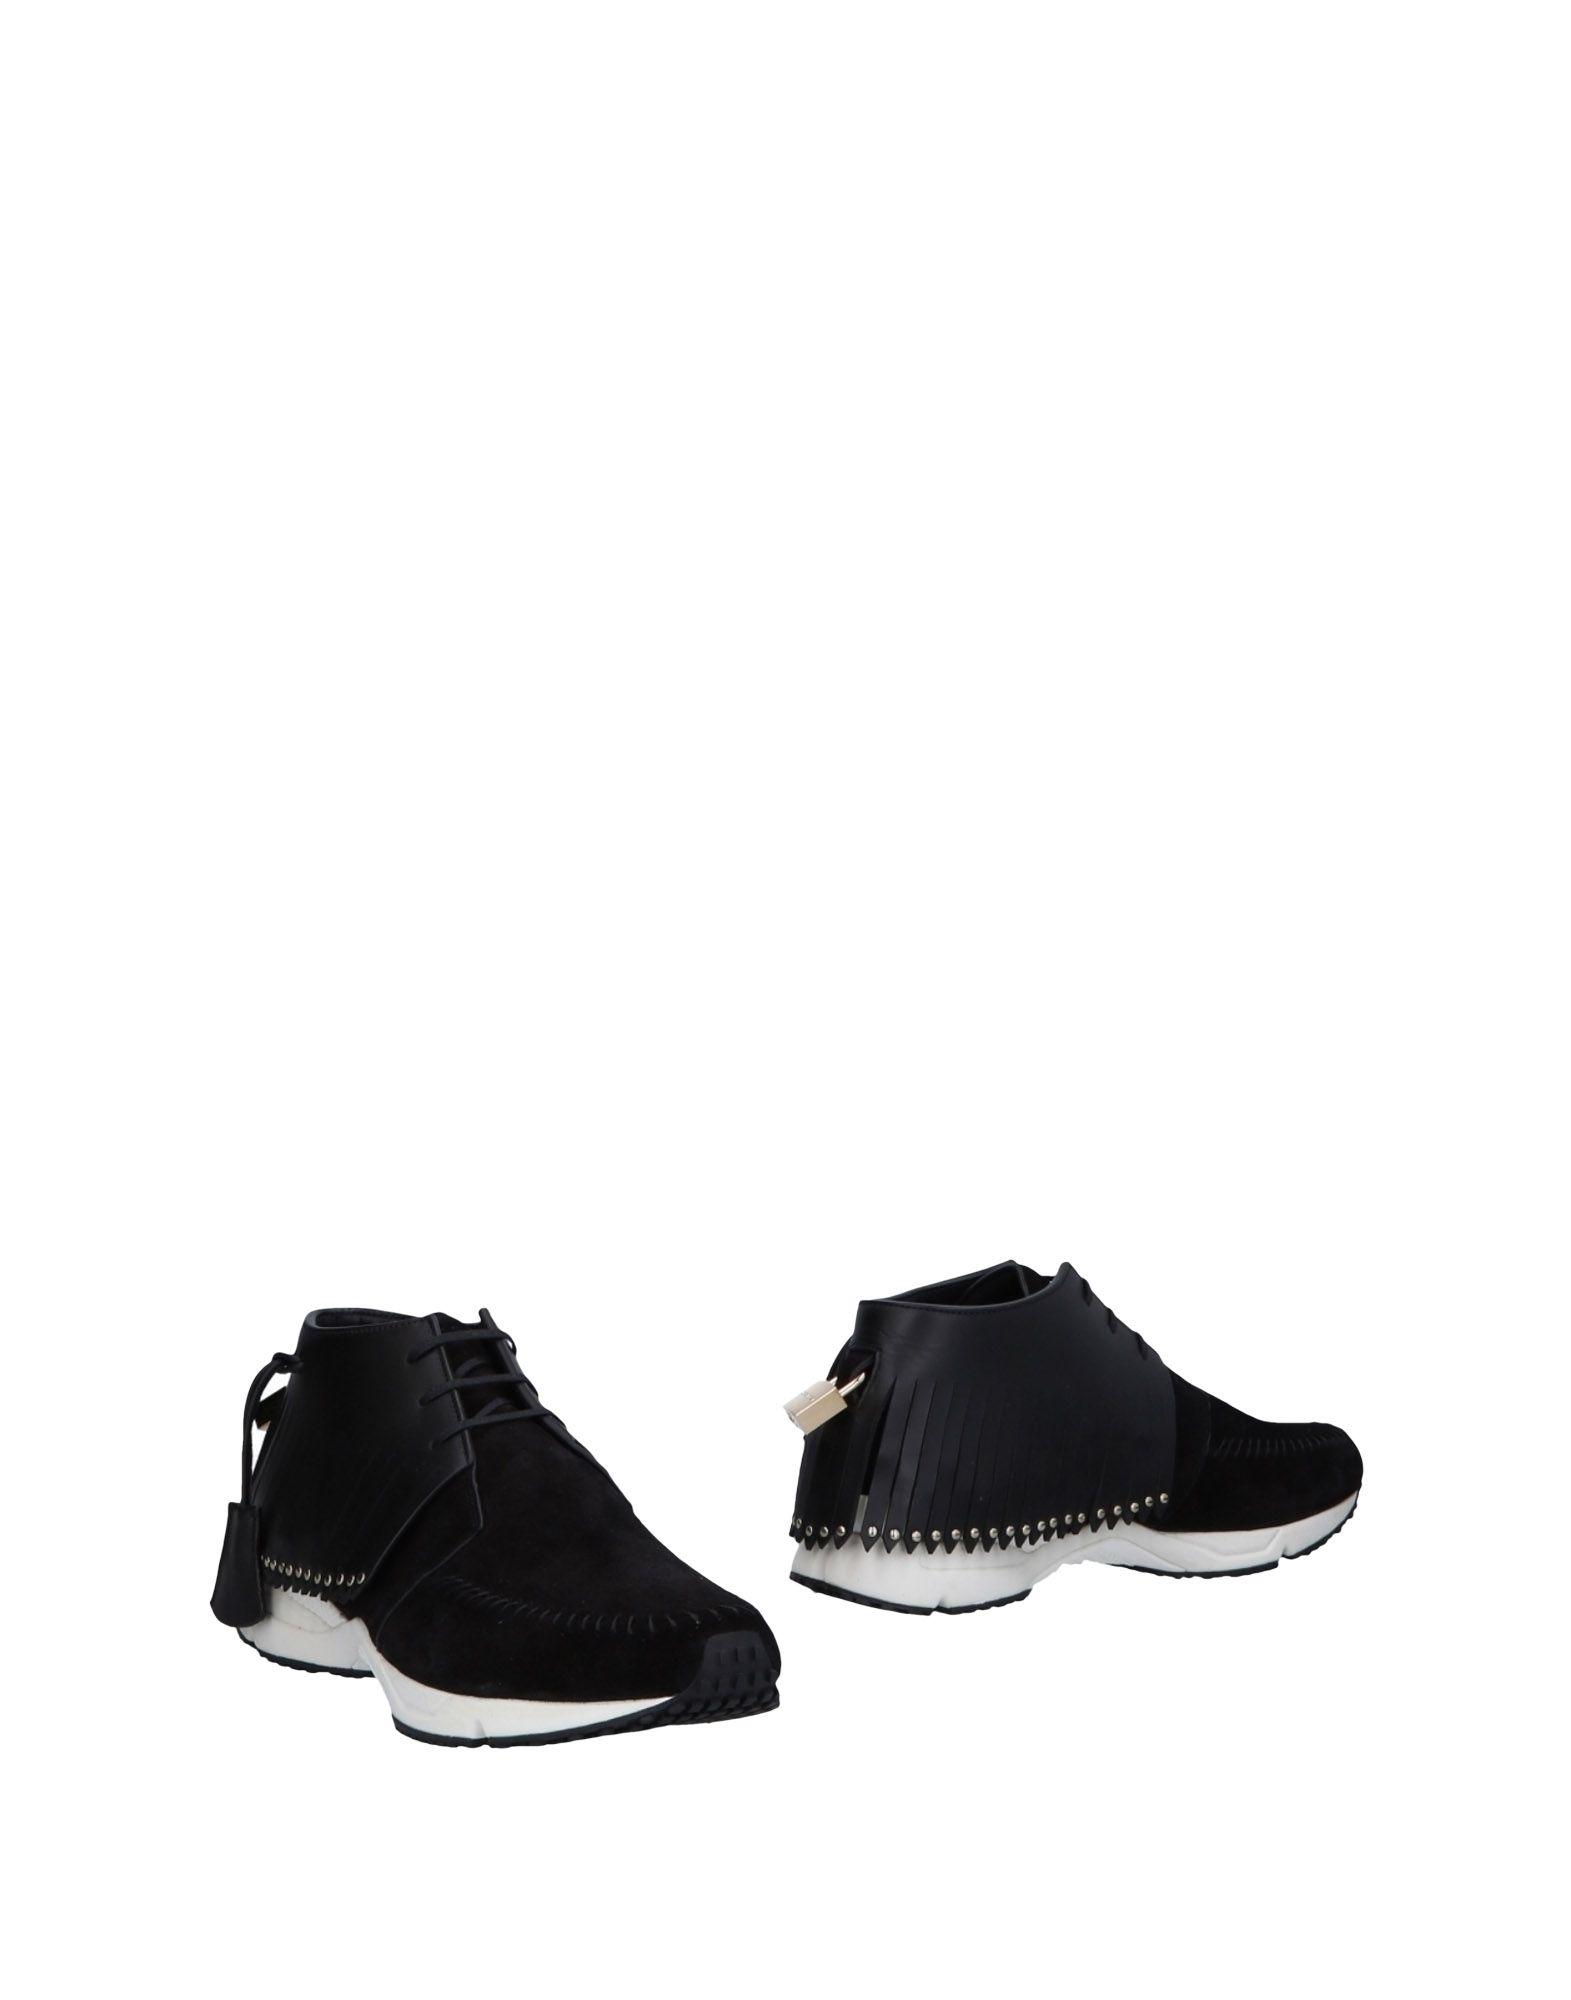 Buscemi Gute Stiefelette Herren  11471370PA Gute Buscemi Qualität beliebte Schuhe 35f195